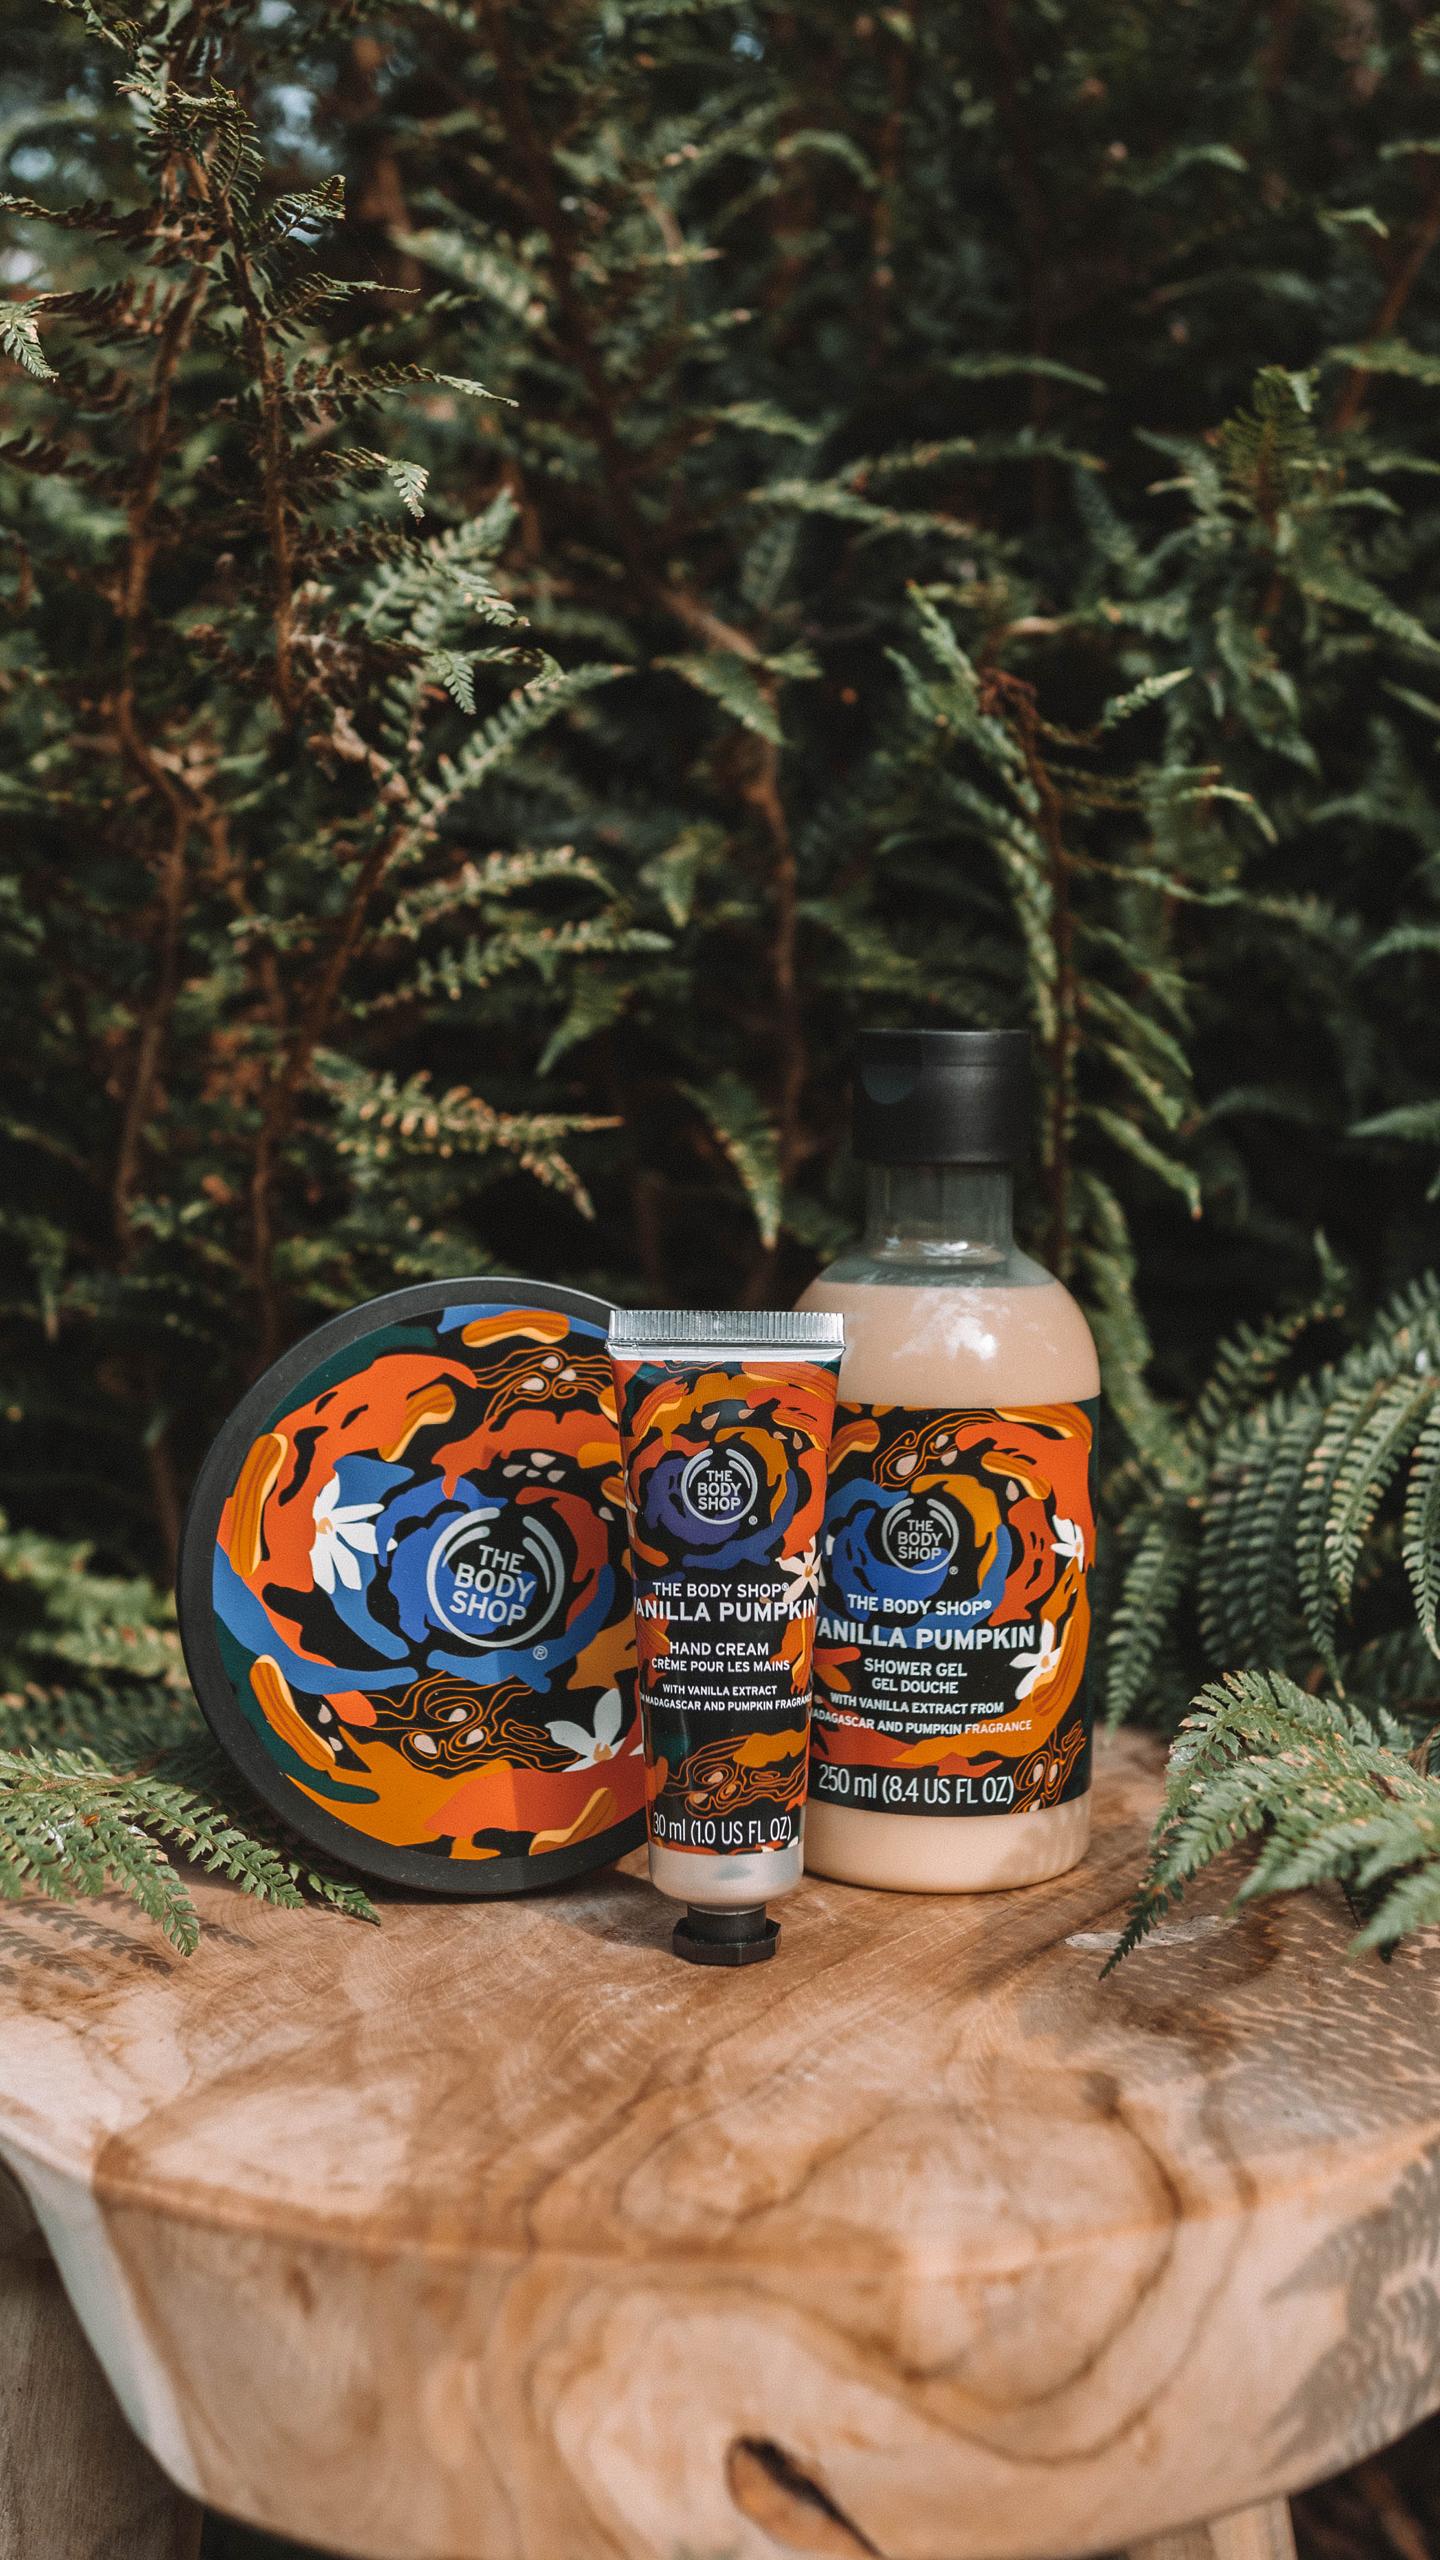 The Body Shop Vanilla Pumpkin Body Care